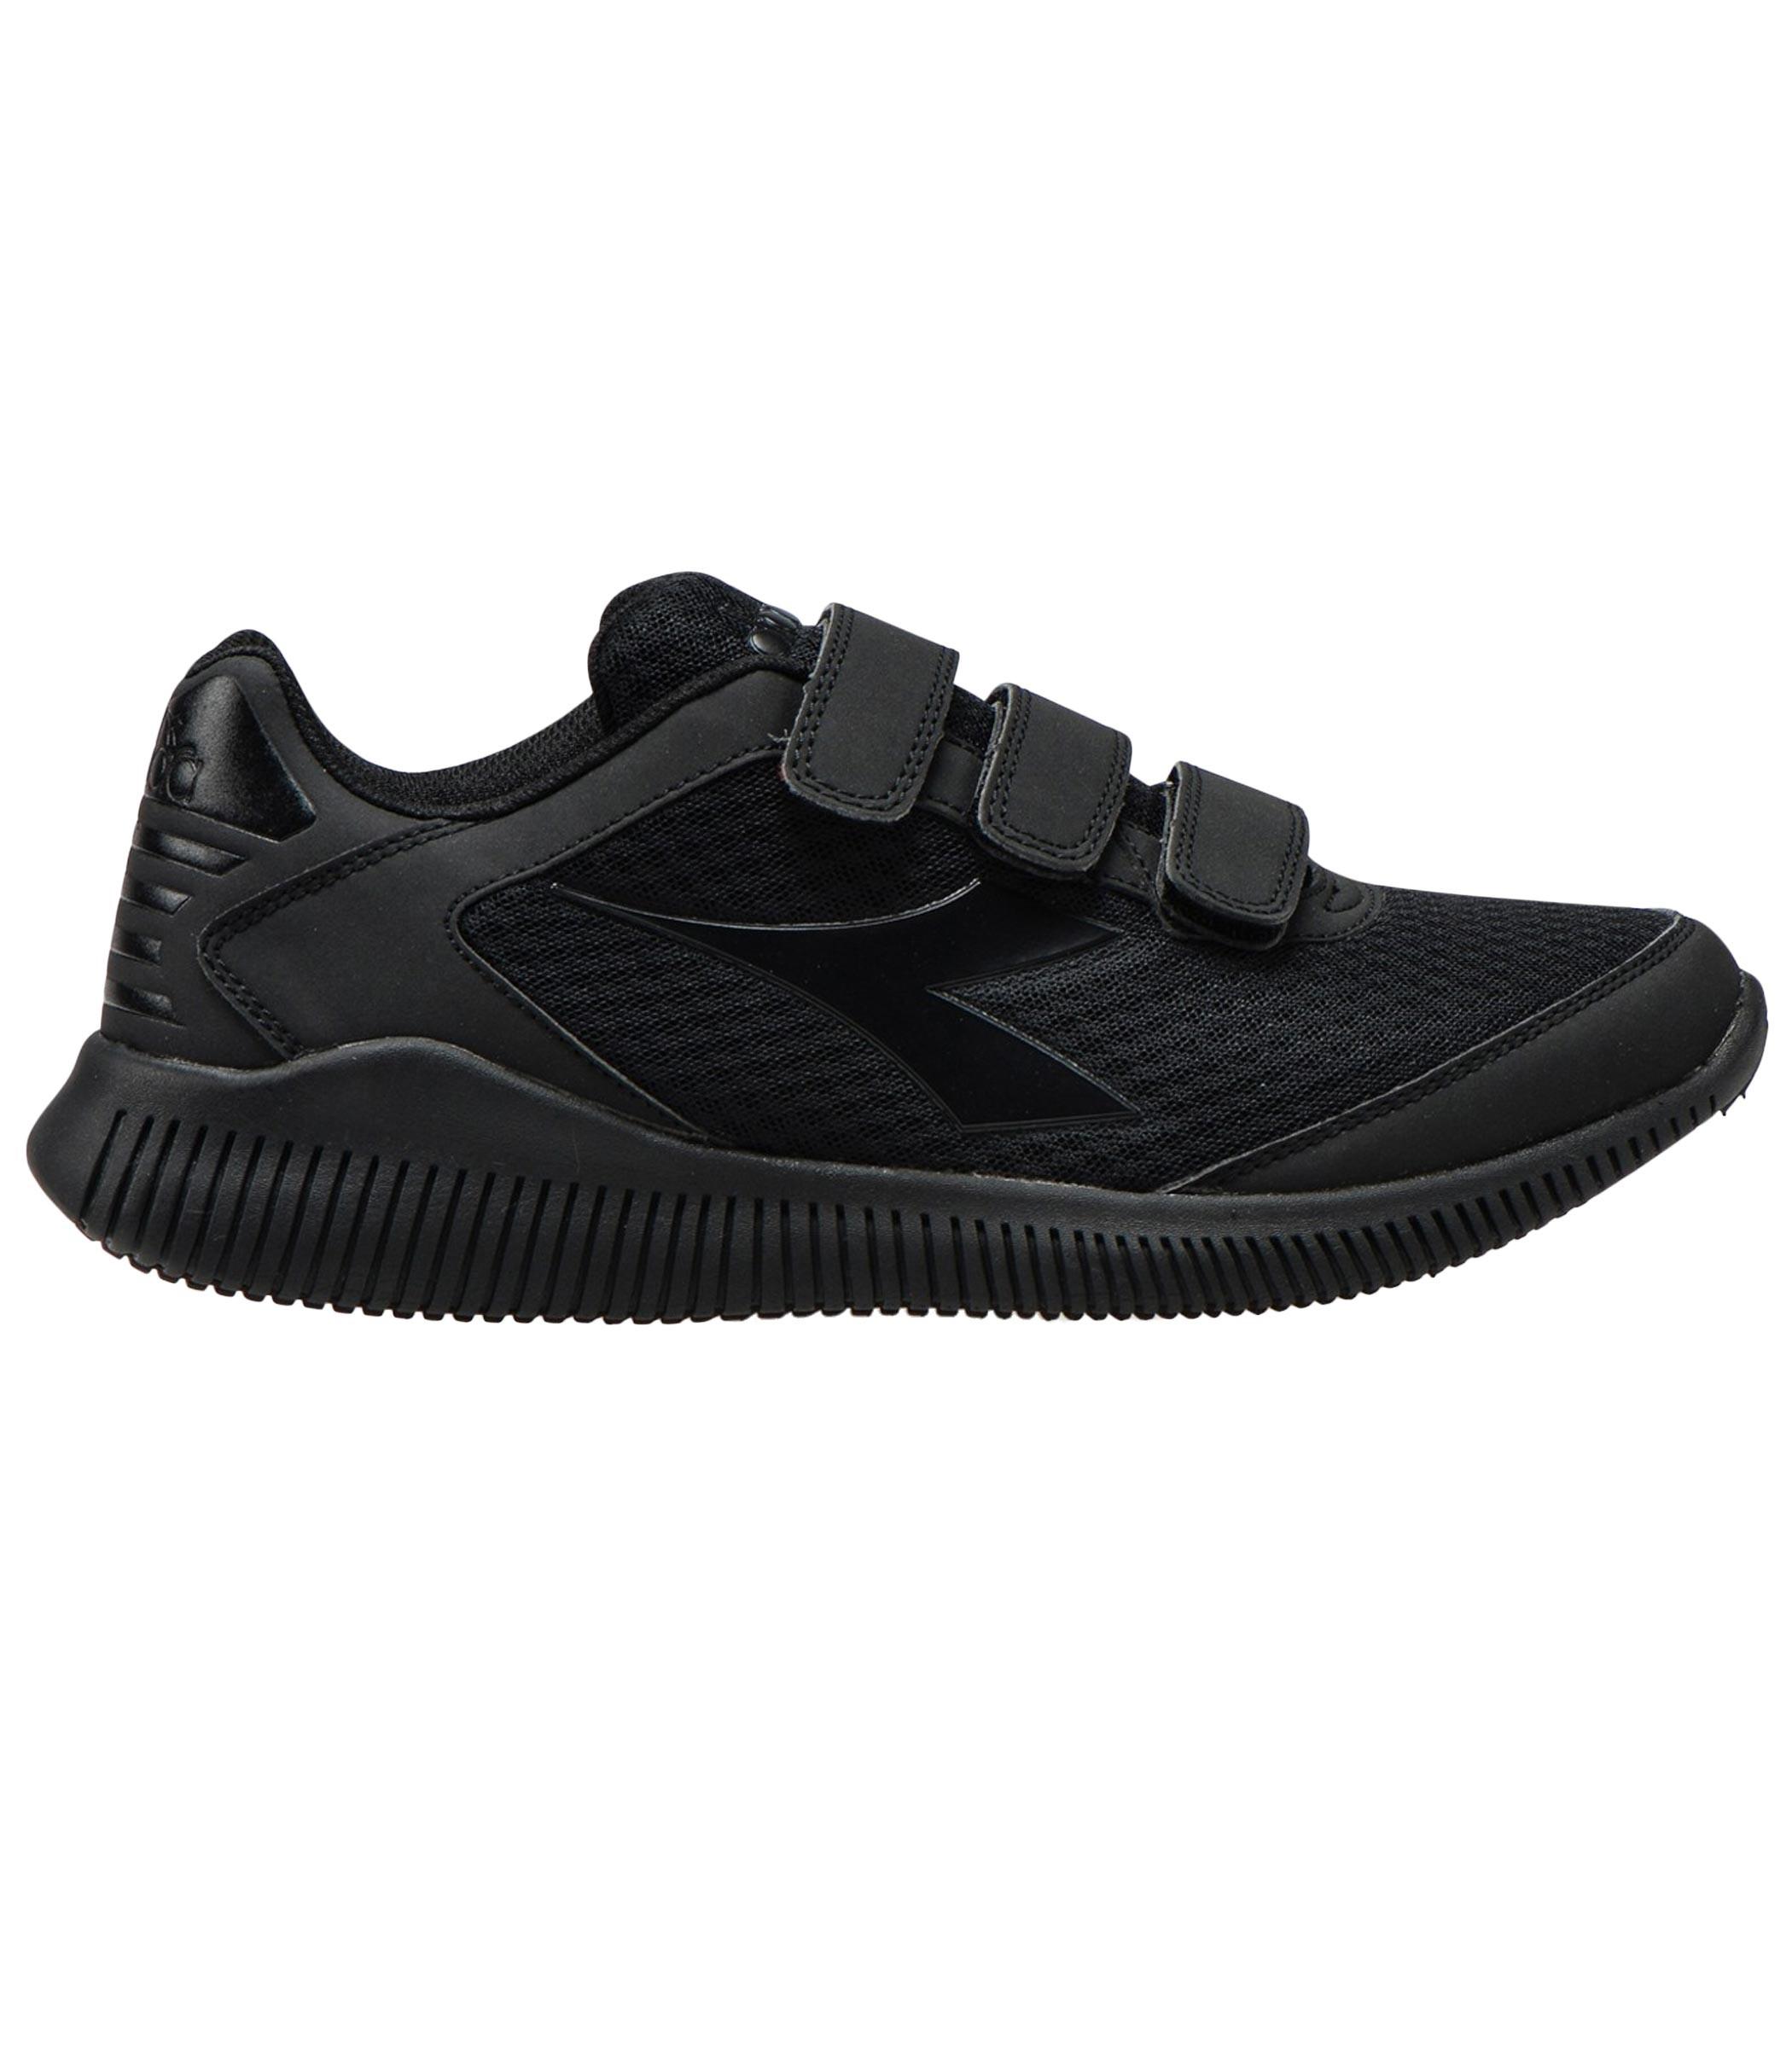 newest 063e6 44cbb Rif Nere Scarpe Da Sneakers Running Uomo Eagle Diadora V ...